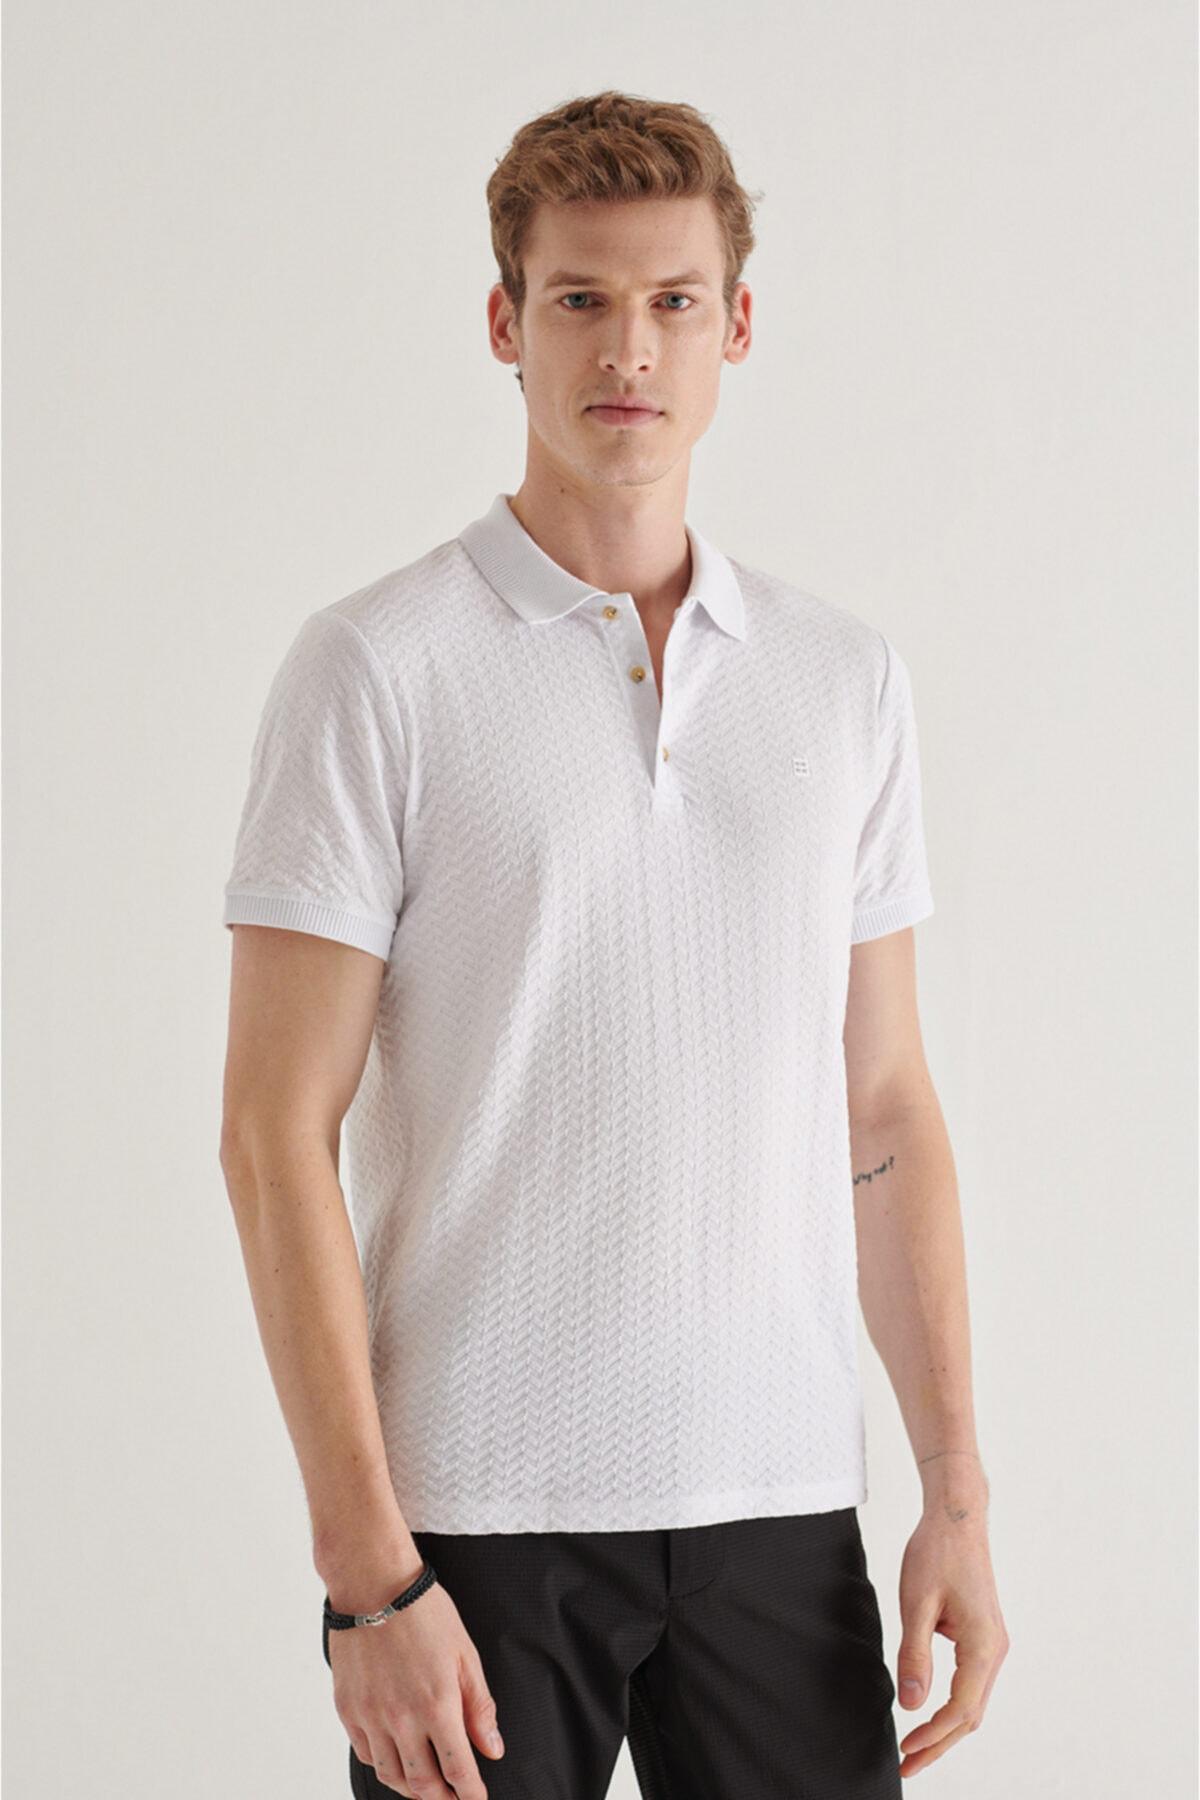 Erkek Beyaz Polo Yaka Jakarlı T-shirt A11y1101